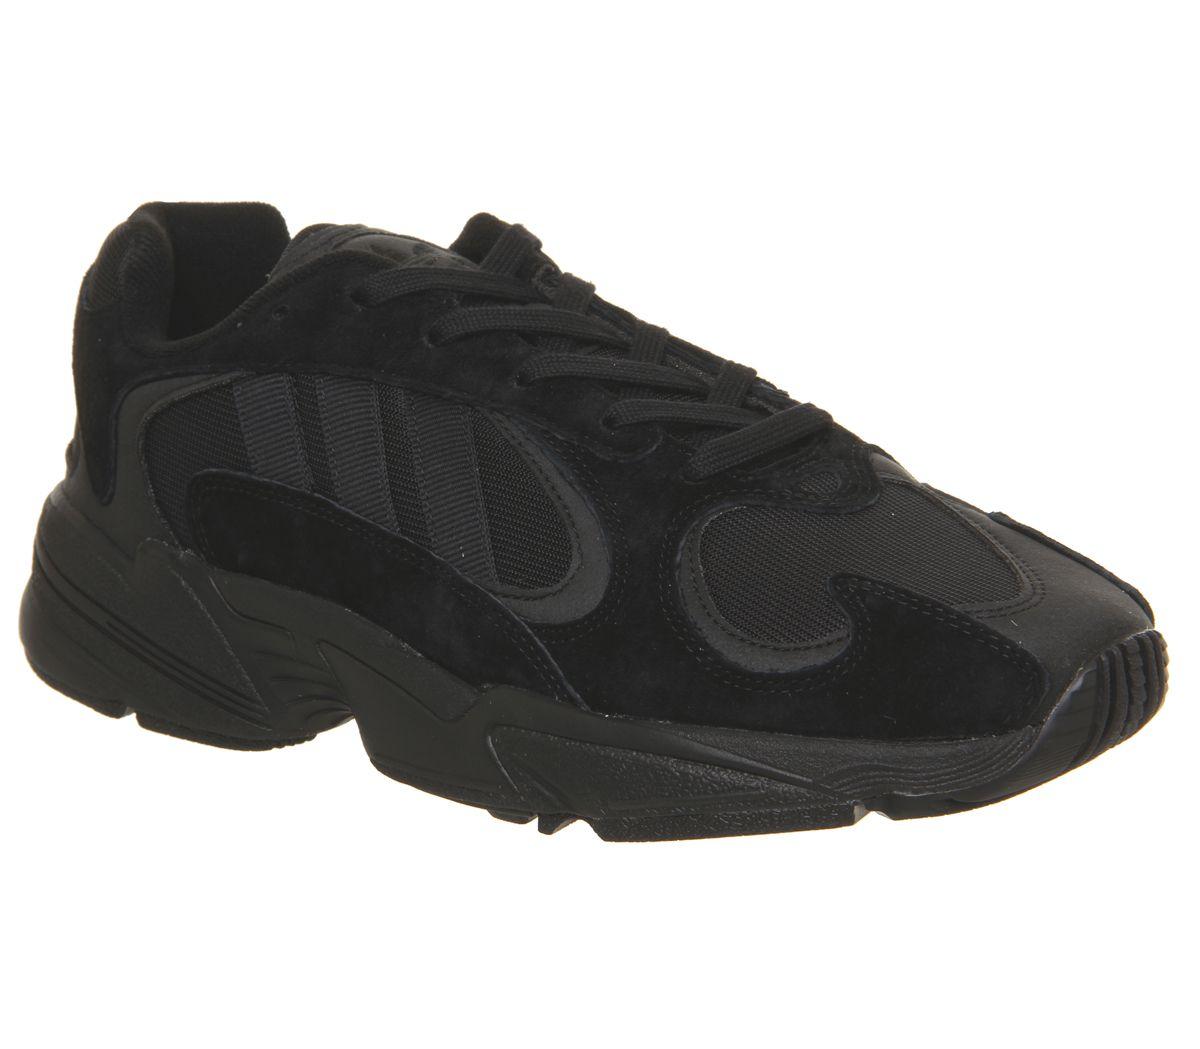 on sale 42093 641d3 adidas, Yung 1 Trainers, Core Black Core Black Carbon